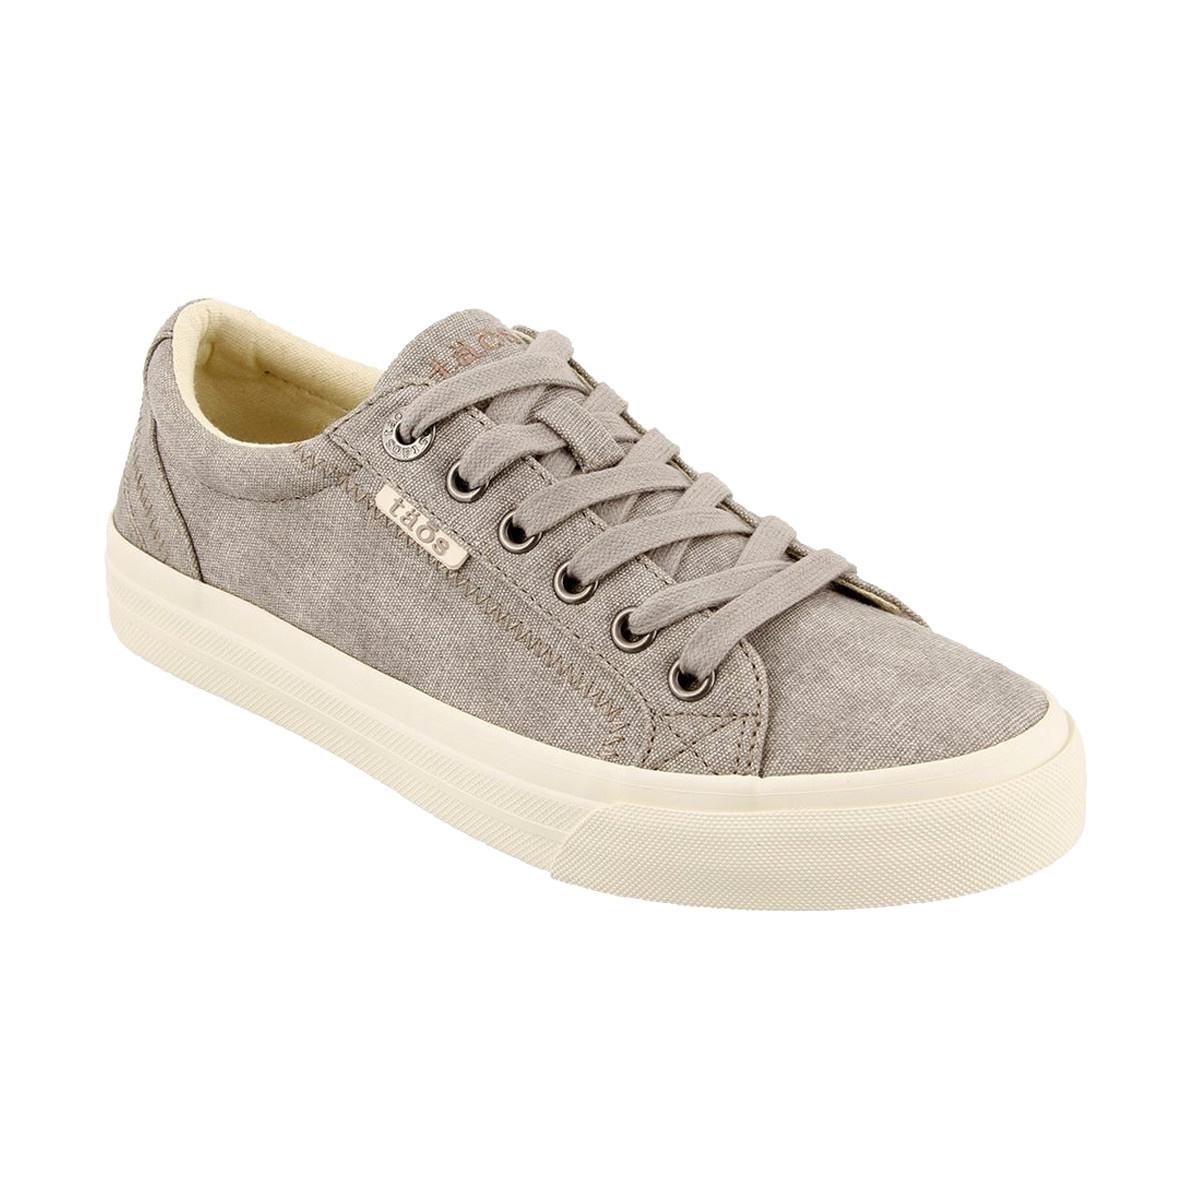 Taos Footwear Taos Women's Plim Soul Grey Sneaker